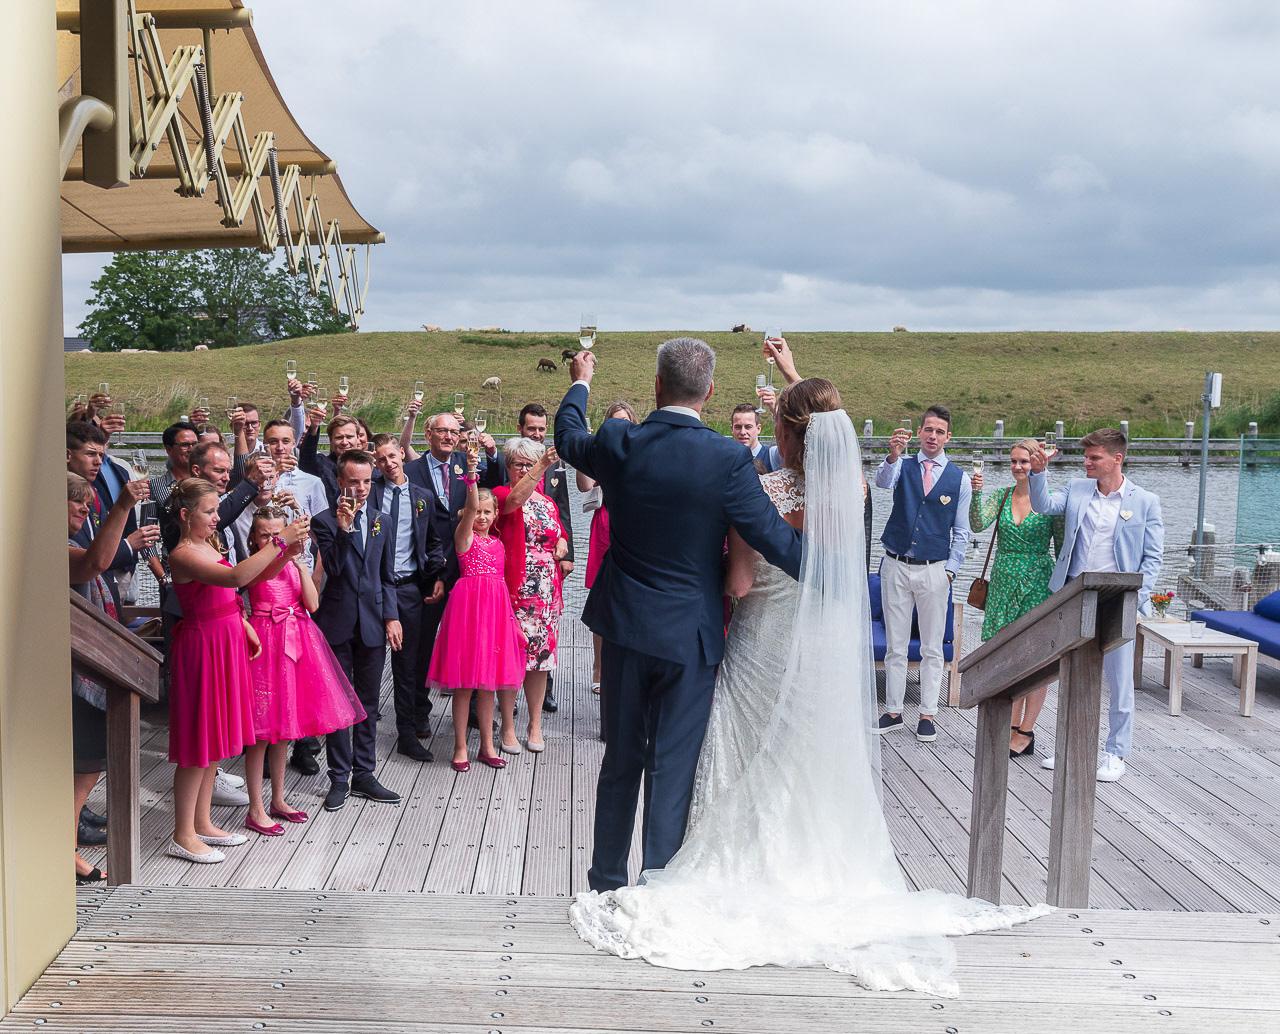 Bruidsfotografie; trouwfotograaf; Bruidspaar proost met alle gasten